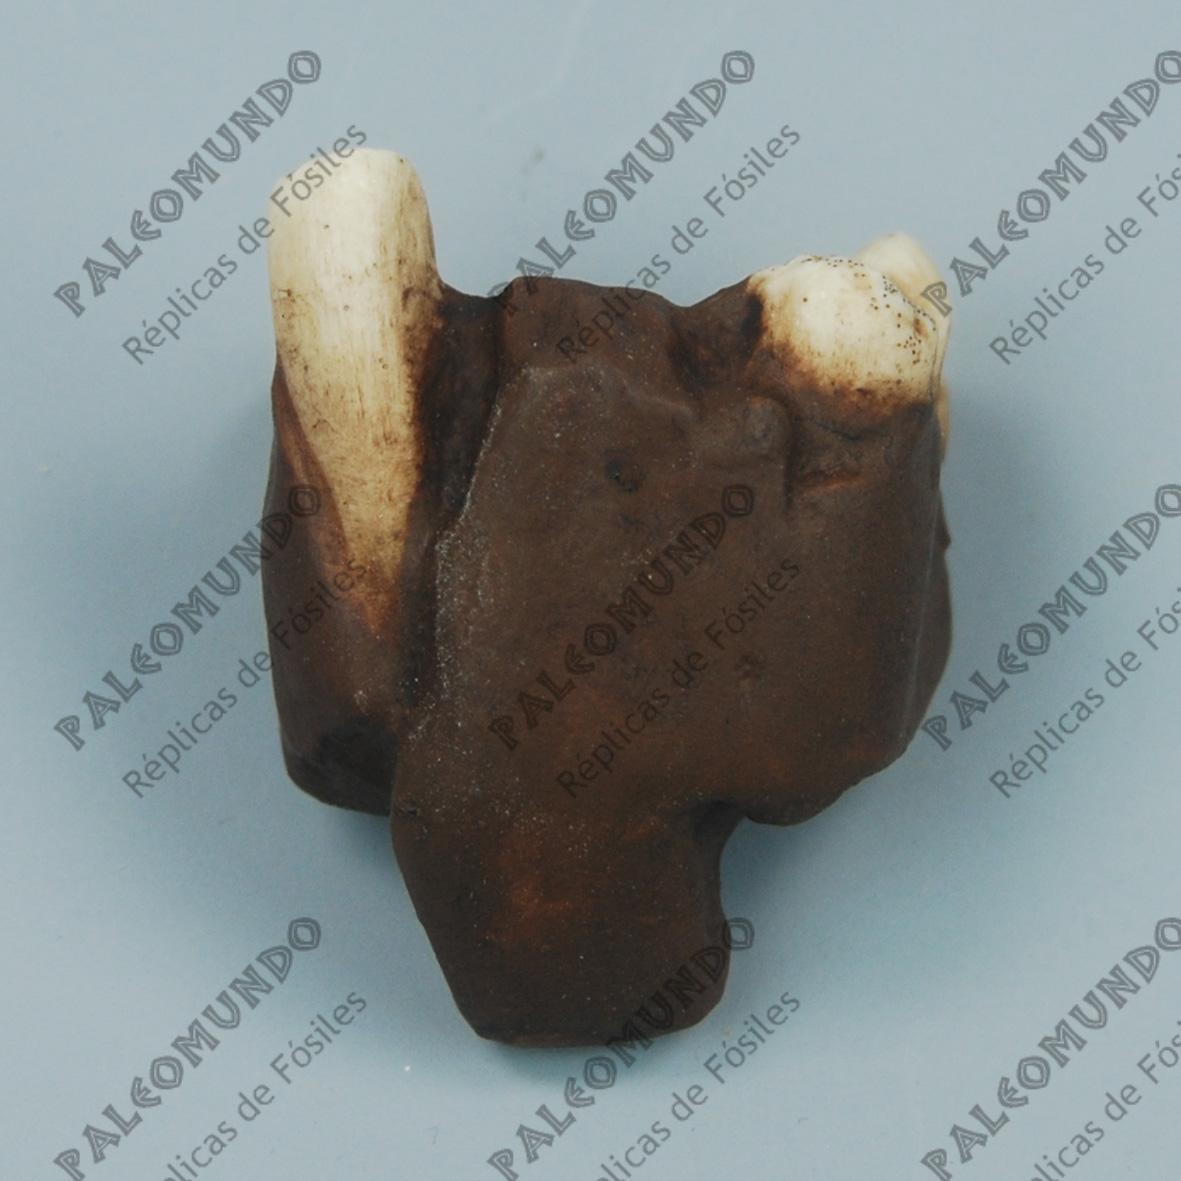 Dryopithecus pilgrimi